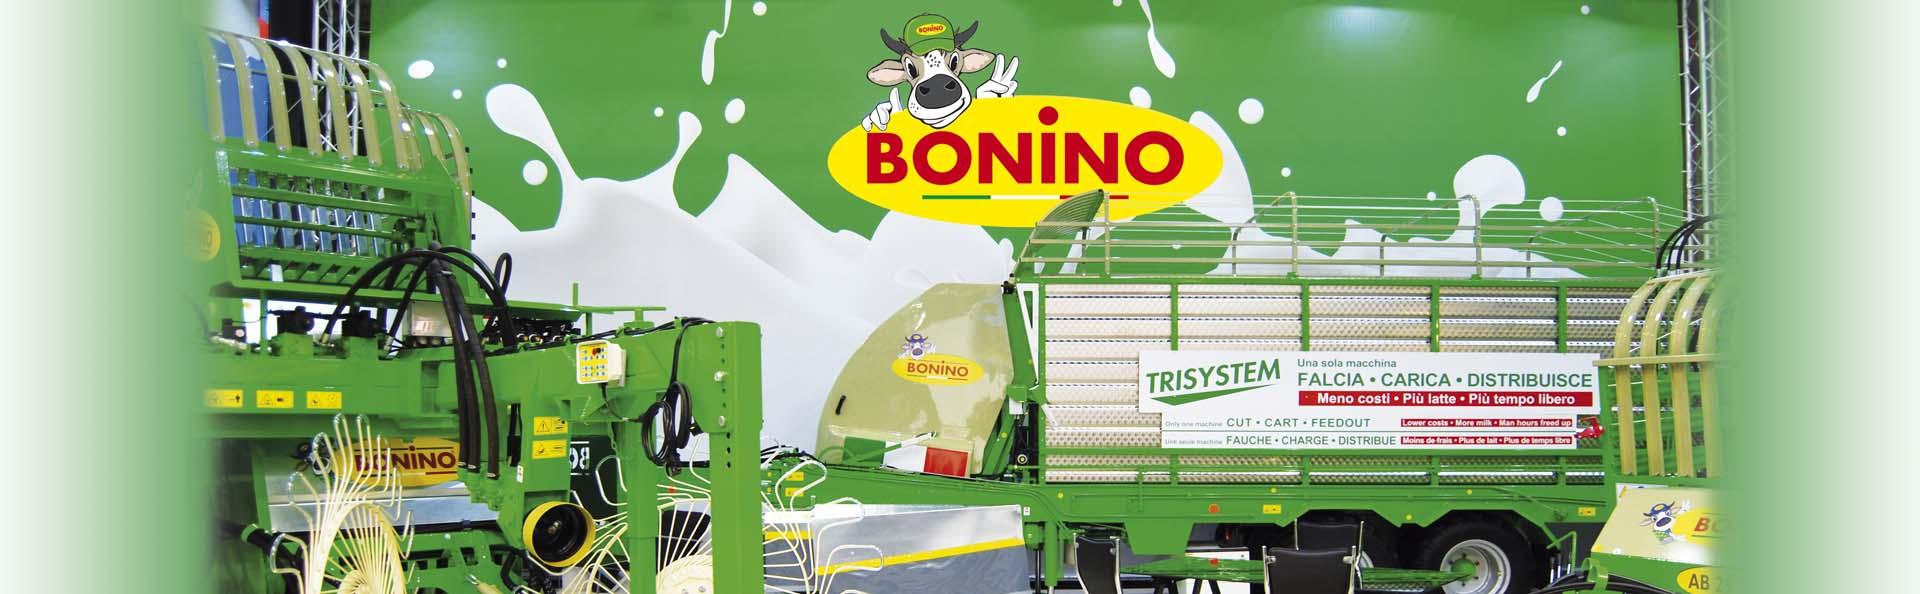 Bonino-macchine-agricole-Sommariva-Bosco-Cuneo-agricultural-machines-machines-agricoles-pour-fourrage-et-récolte-plantes-aromatiques-maquinaria-agricola-Landmaschinen